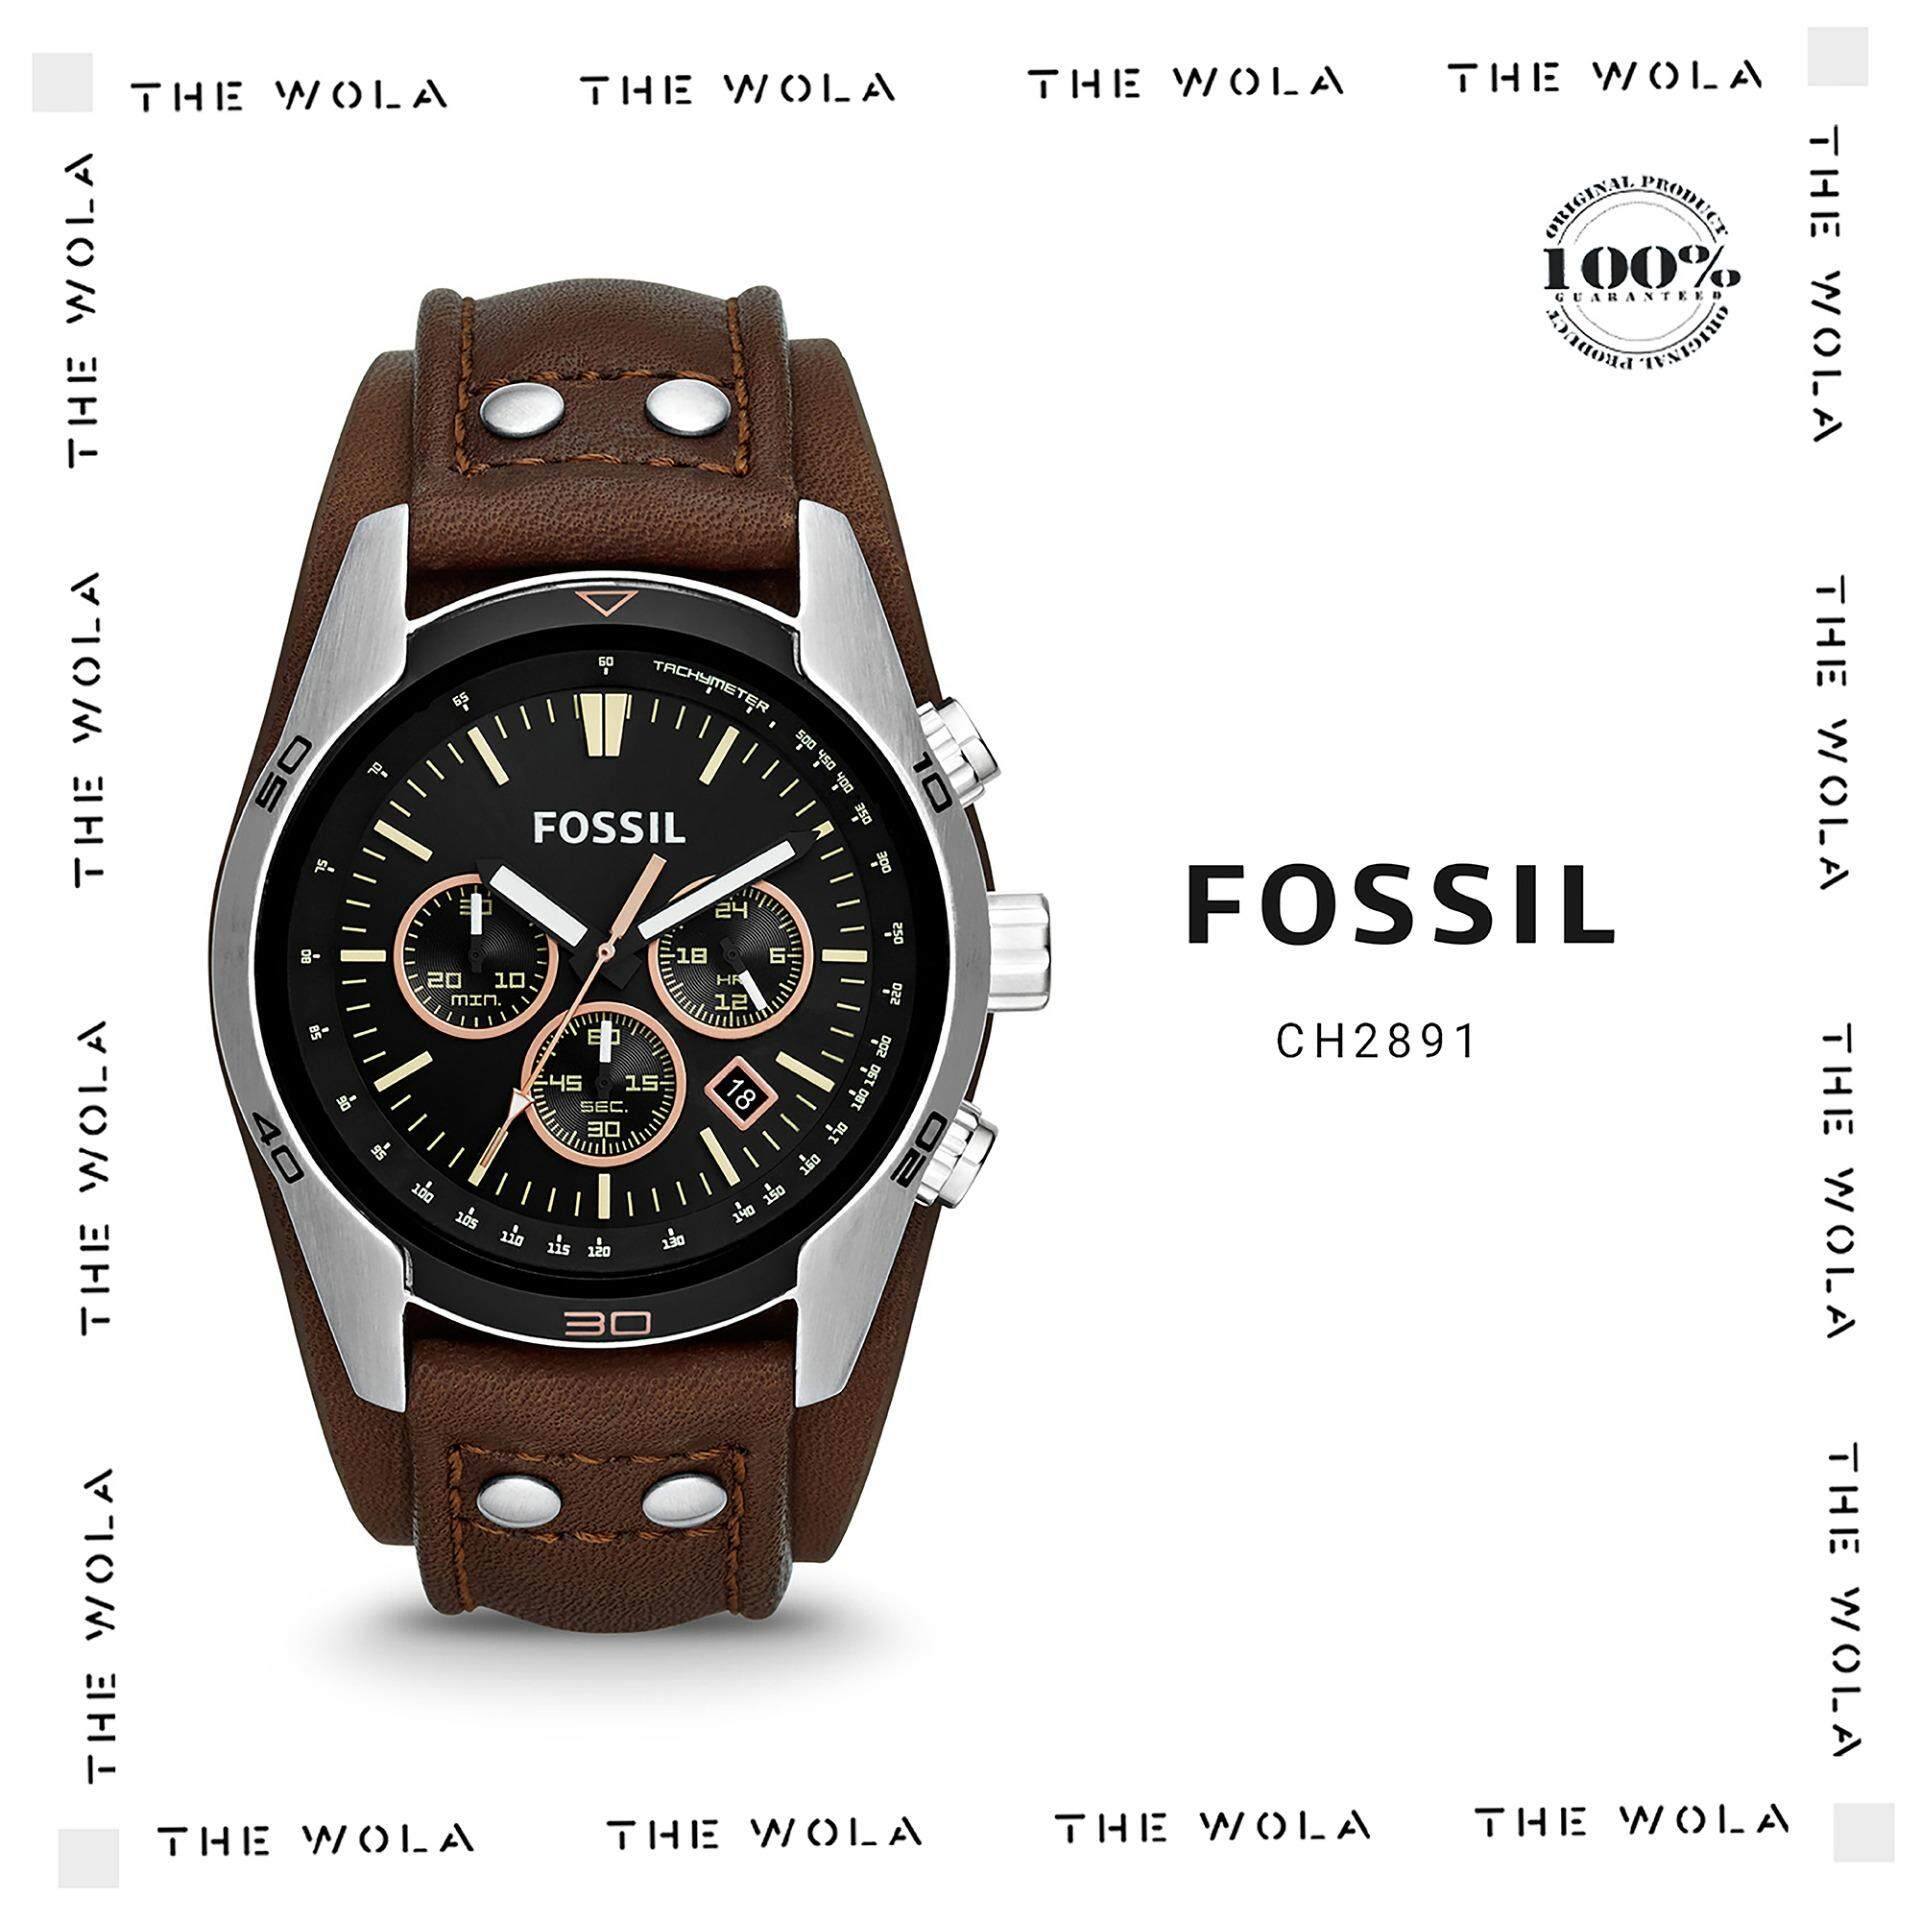 Fossil Watches Price In Malaysia Best Lazada Es3837 Jam Tangan Wanita Original Casual Men Watch Ch2891 Genuine 2 Years Warranty